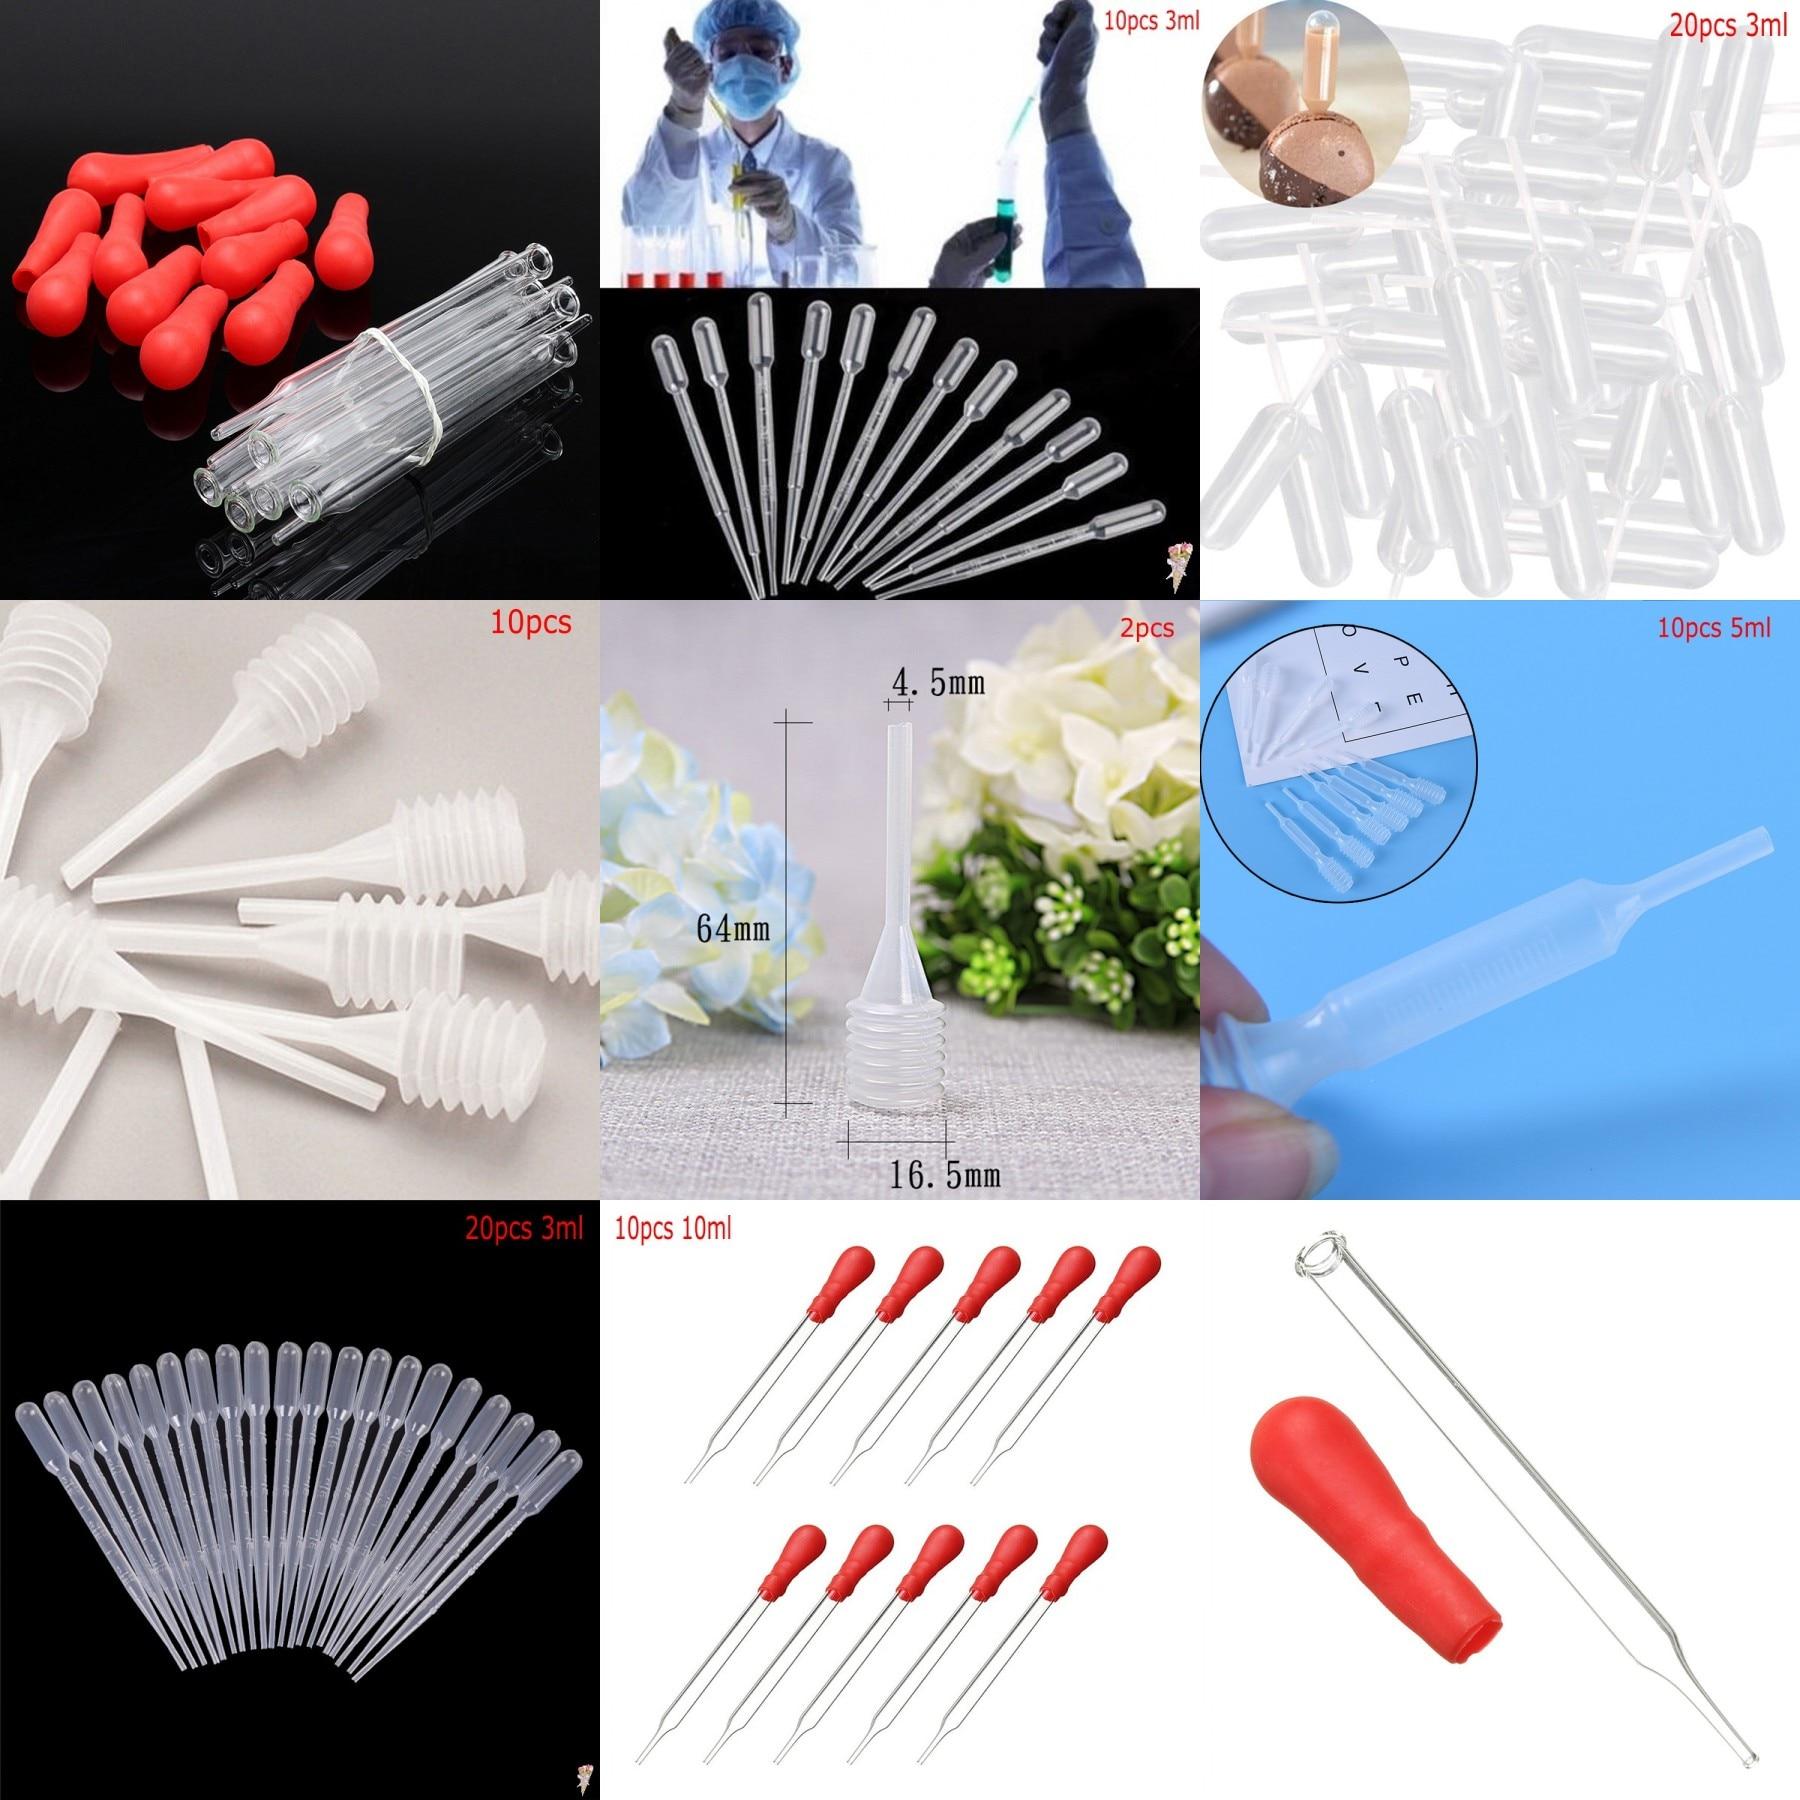 2/10/20/50/pcs 3/5/10ml Rubber Head Lab Dropper Pipette Glass Experiment Medical Pipette Dropper Transfer Pipette Lab Supplie